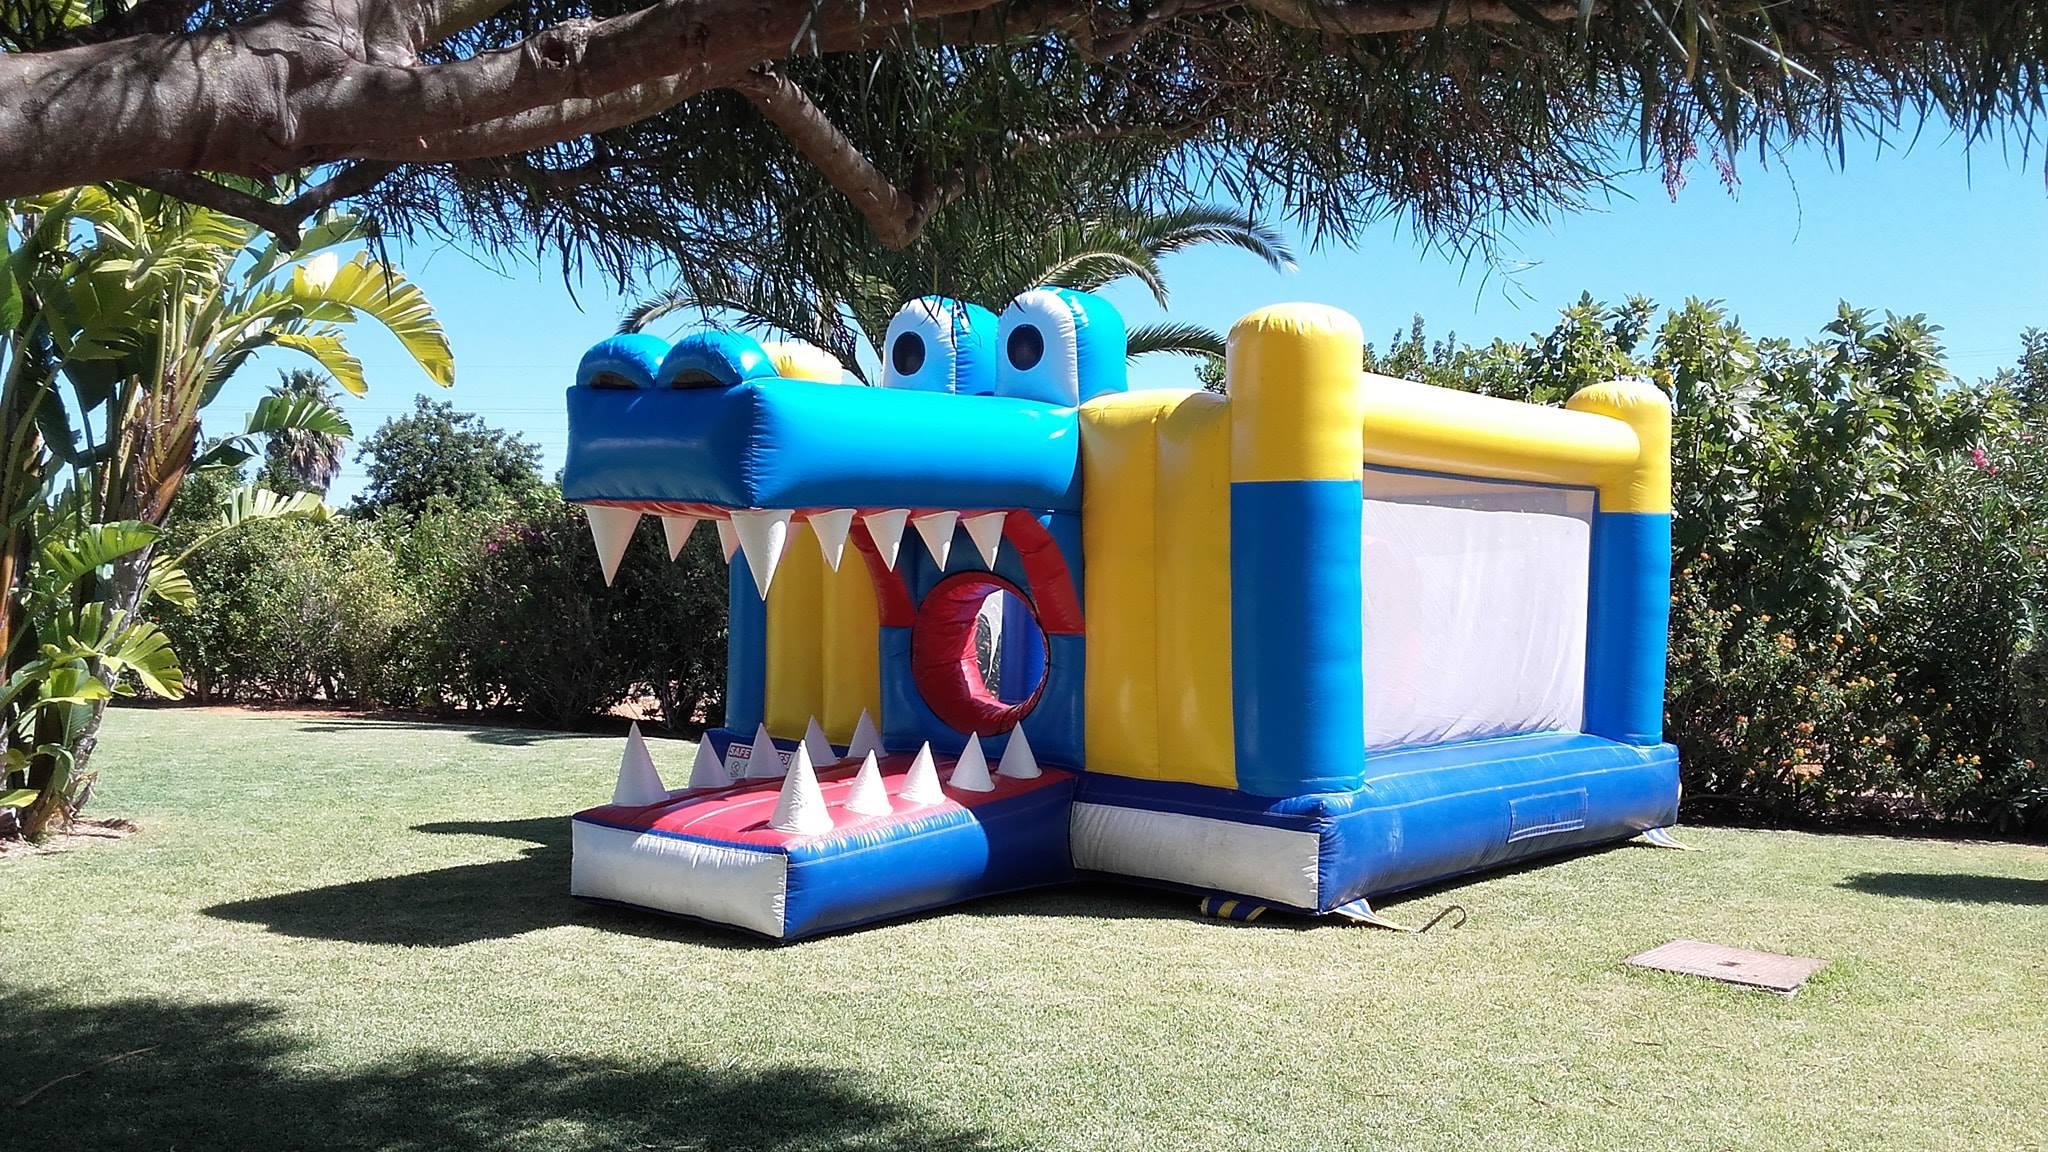 Insuflável Crocodilo | Aluguer de Insufláveis Oficina de Sonhos Algarve